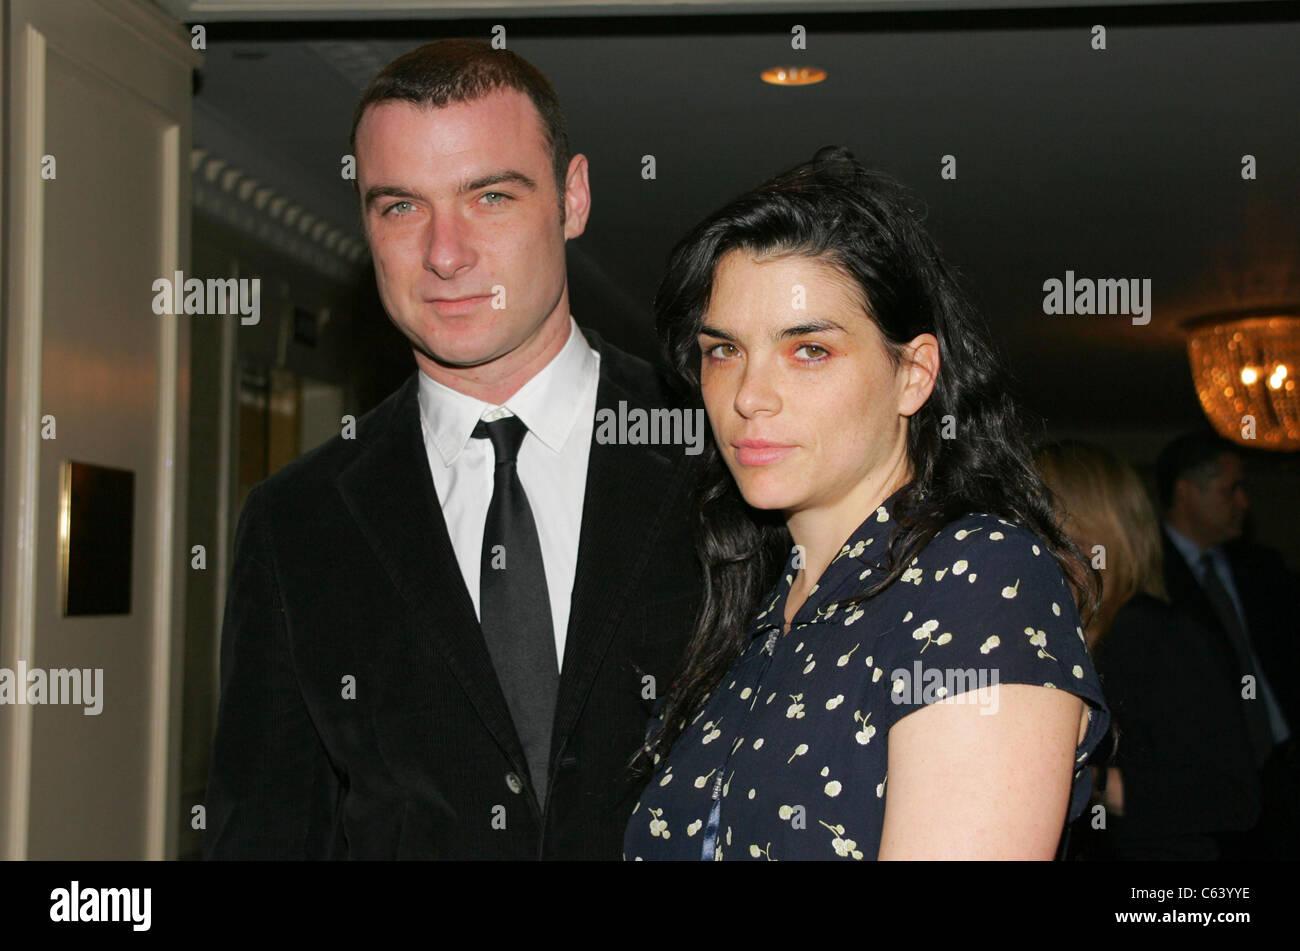 Juan Pablo Galavis Is Married to Osmariel Villalobos